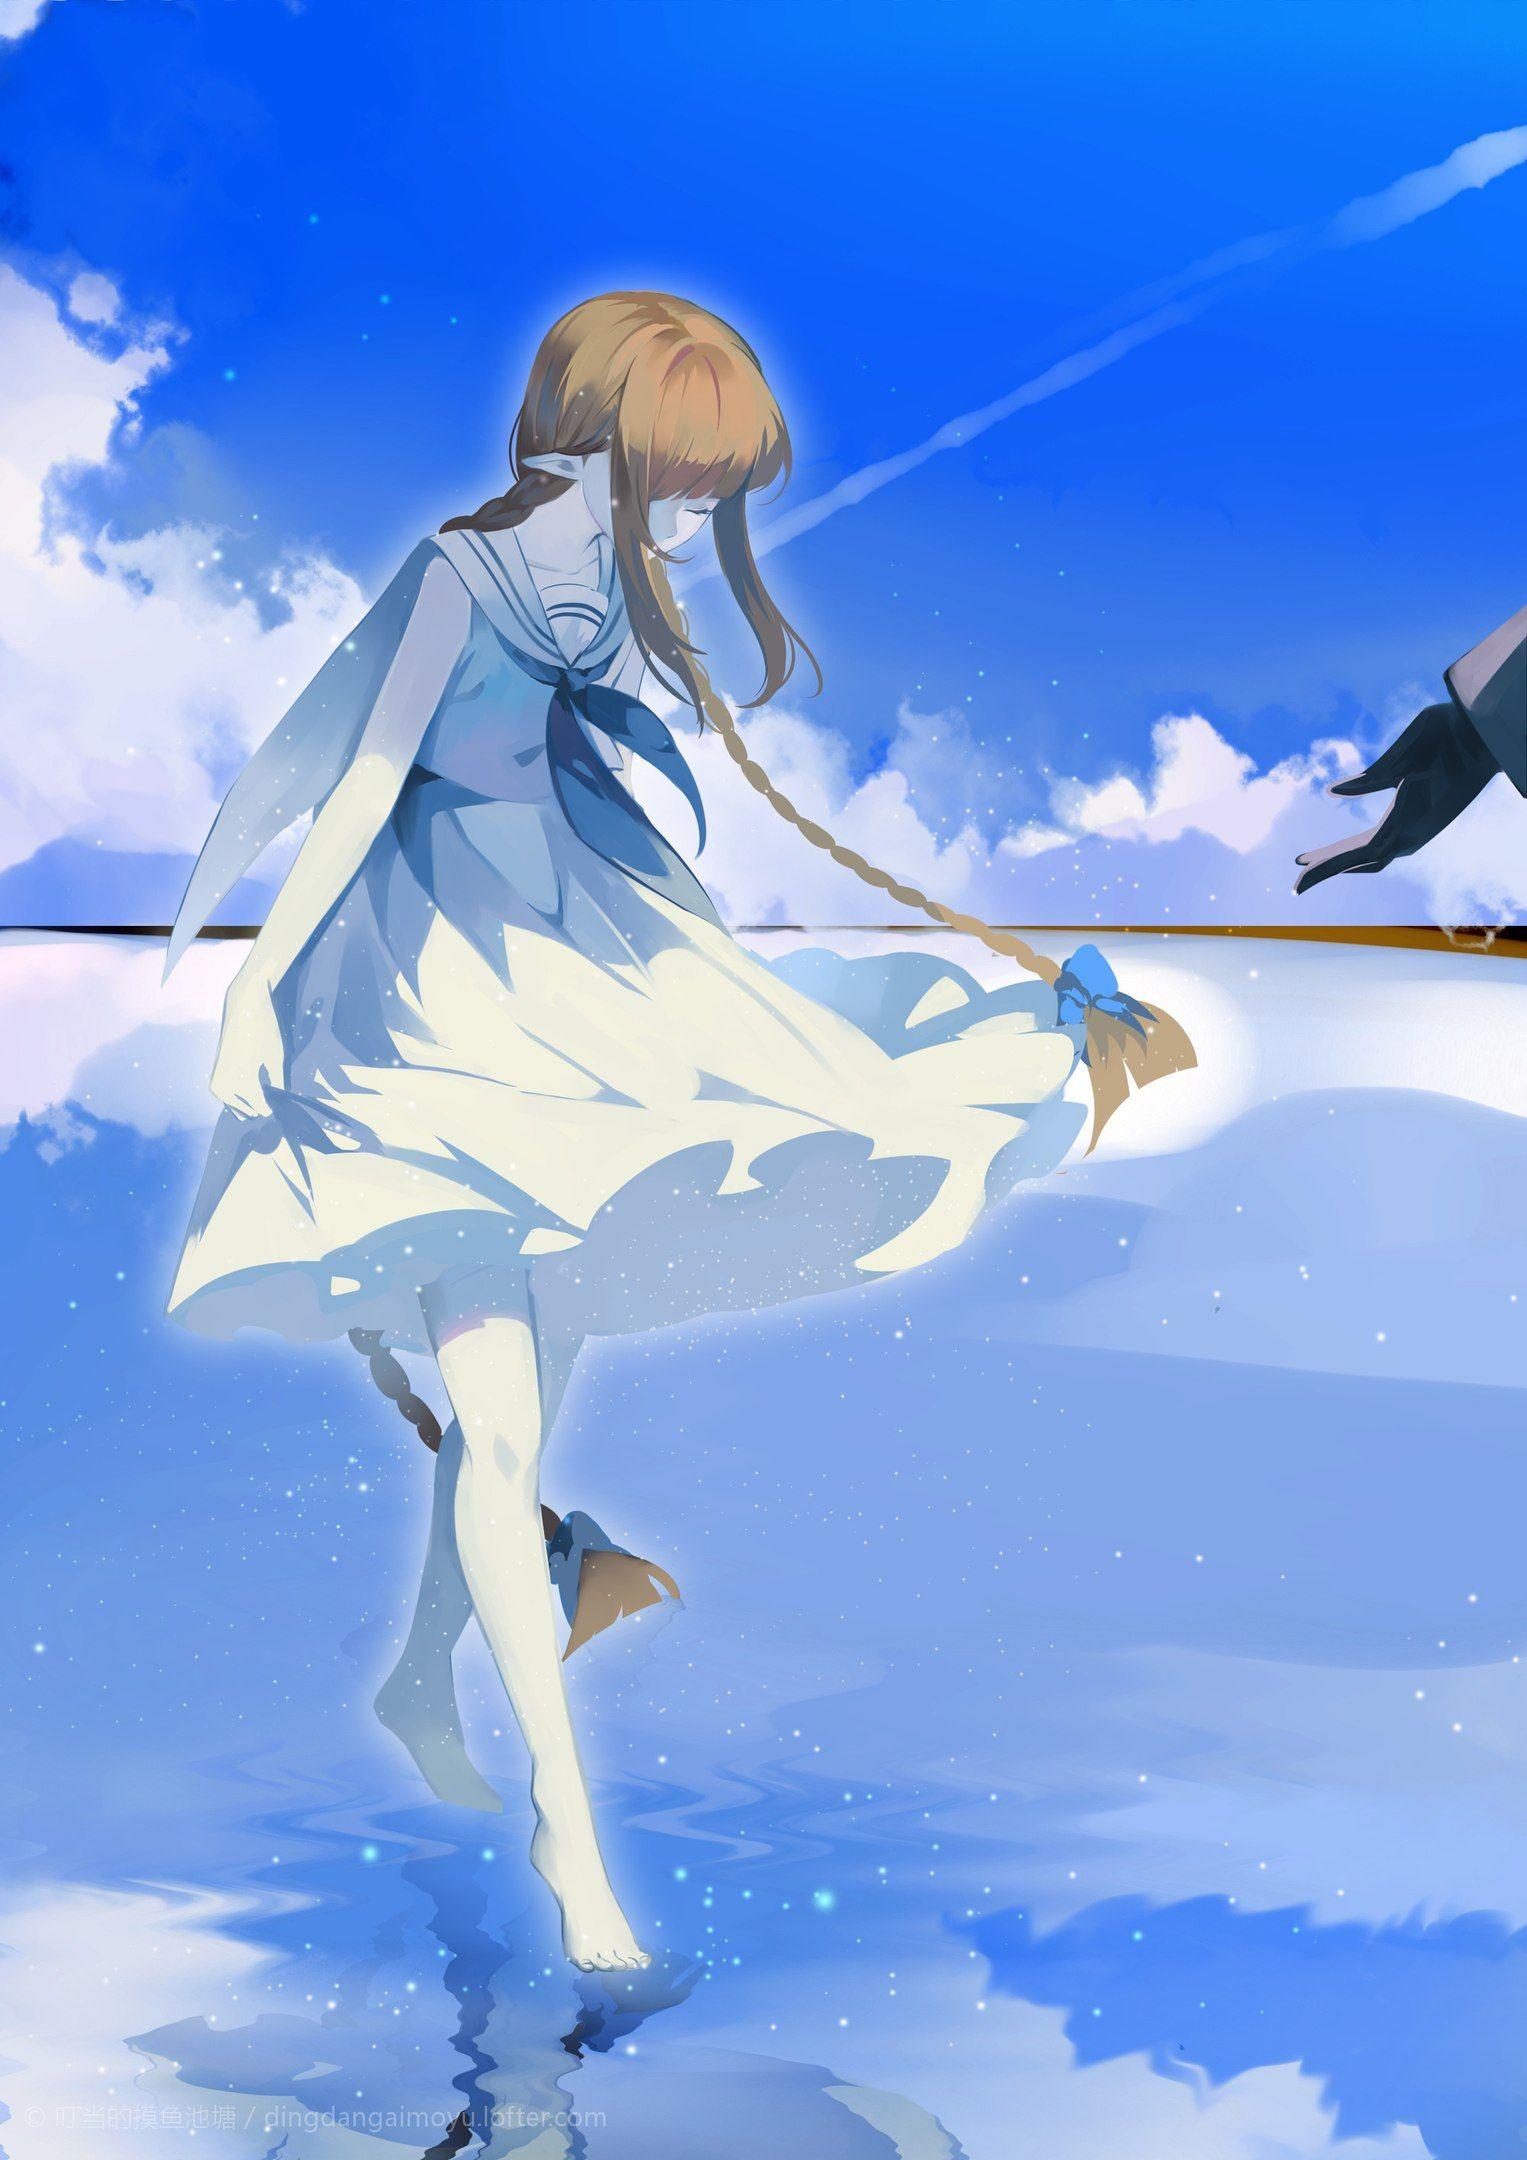 Pin by ( ̄^ ̄)鮫吉 on watgbs Blue sea, Anime, Rpg horror games